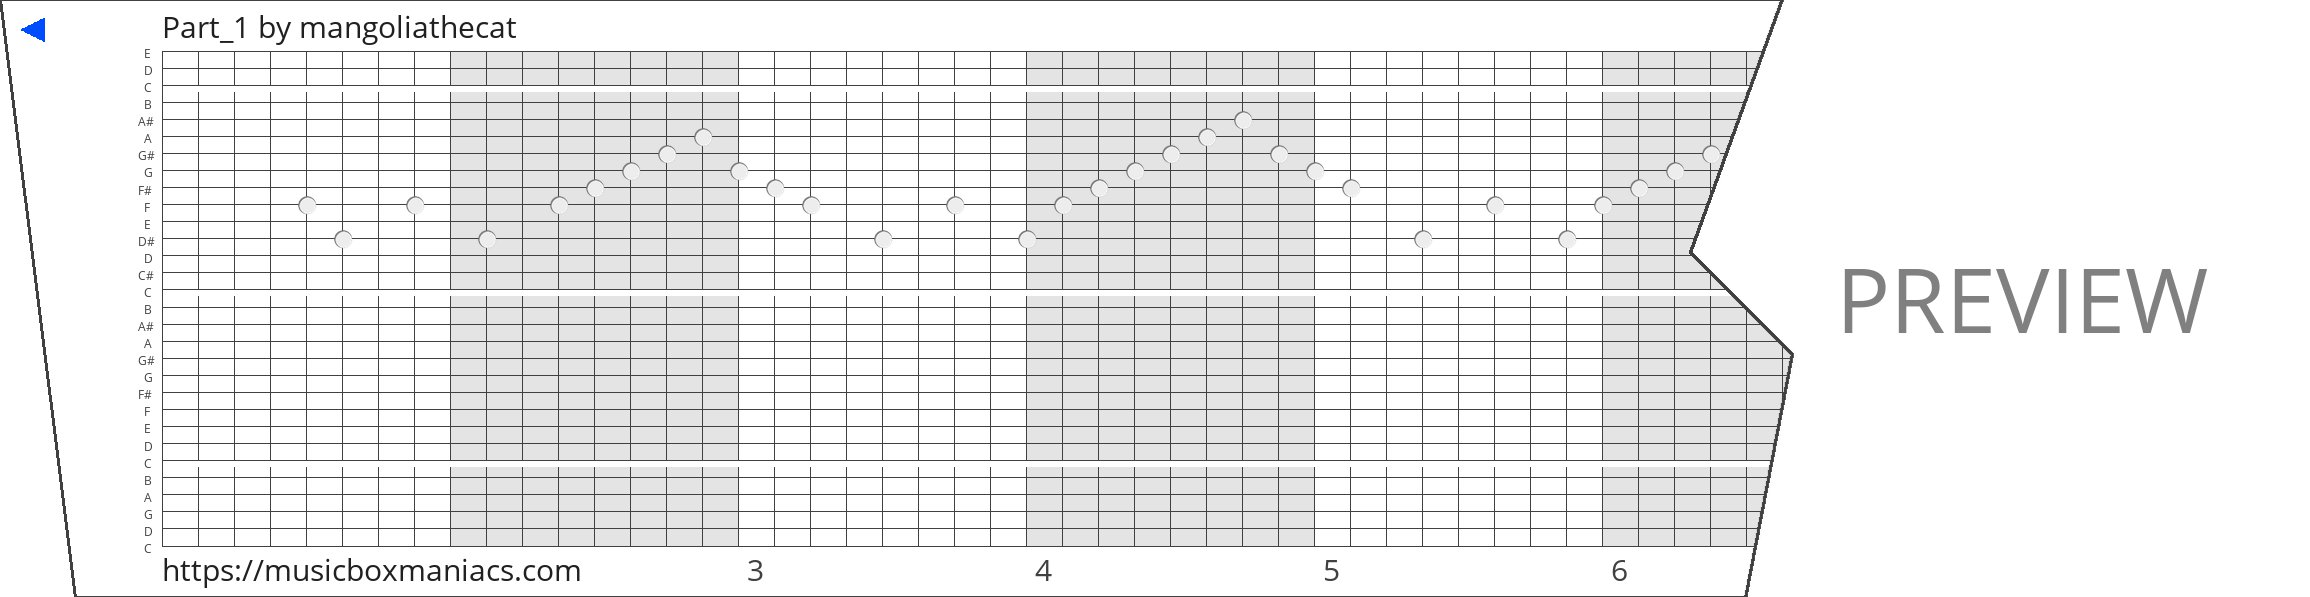 Part_1 30 note music box paper strip